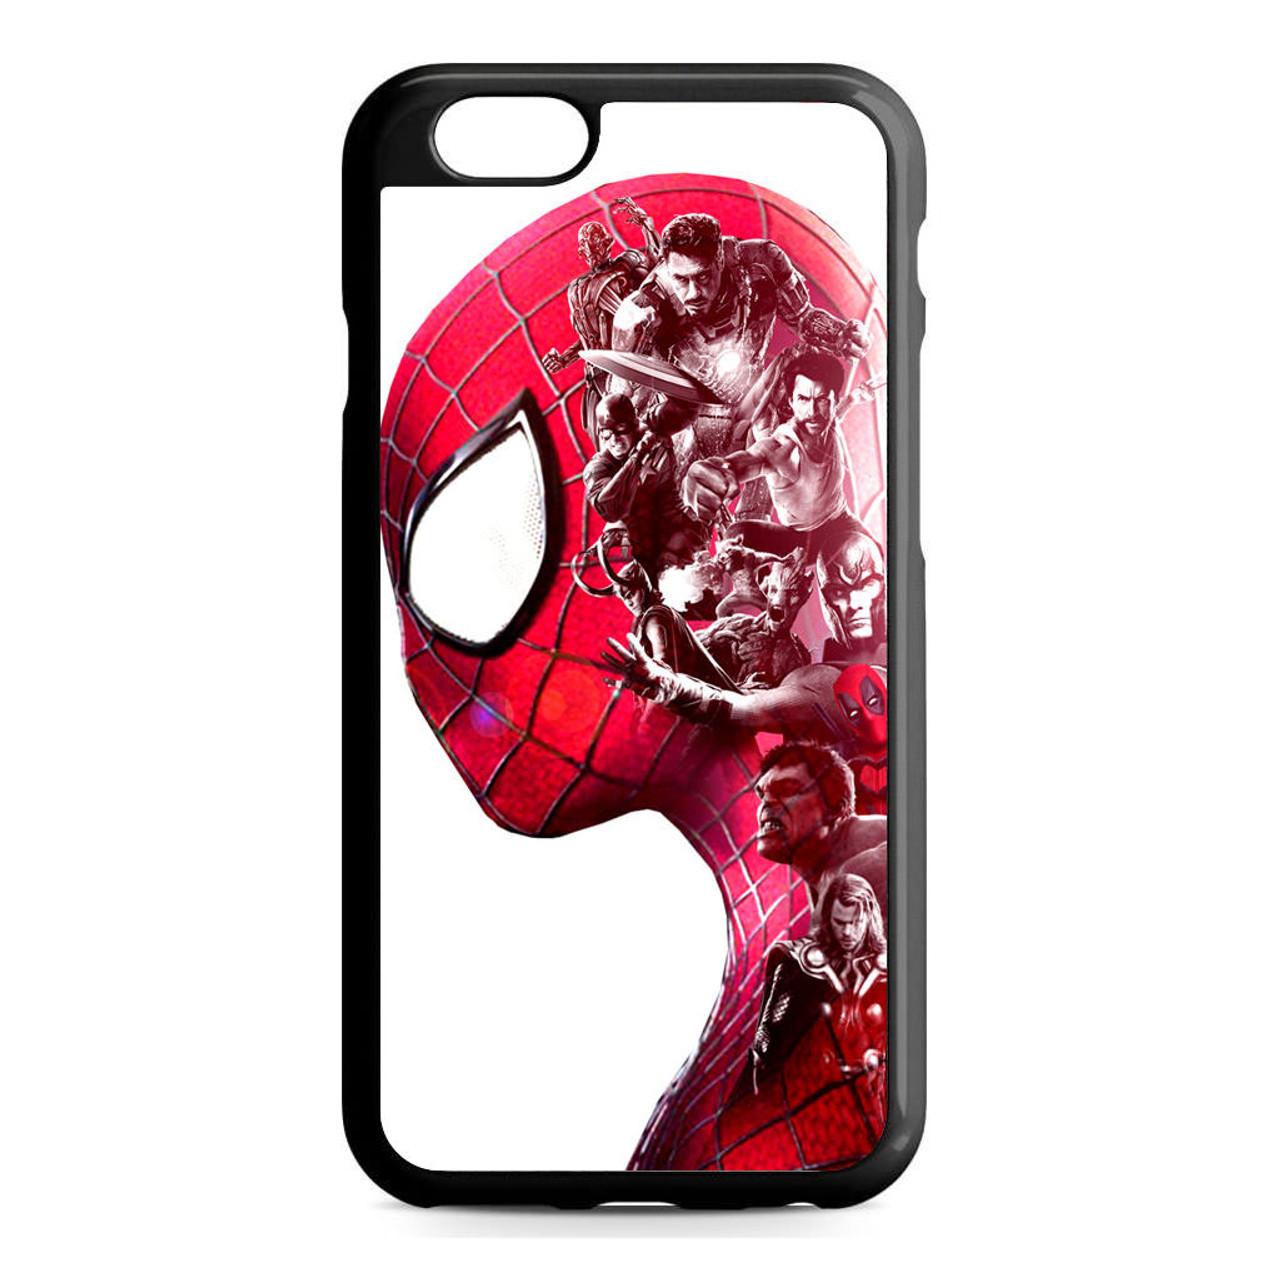 iphone 6 case spiderman